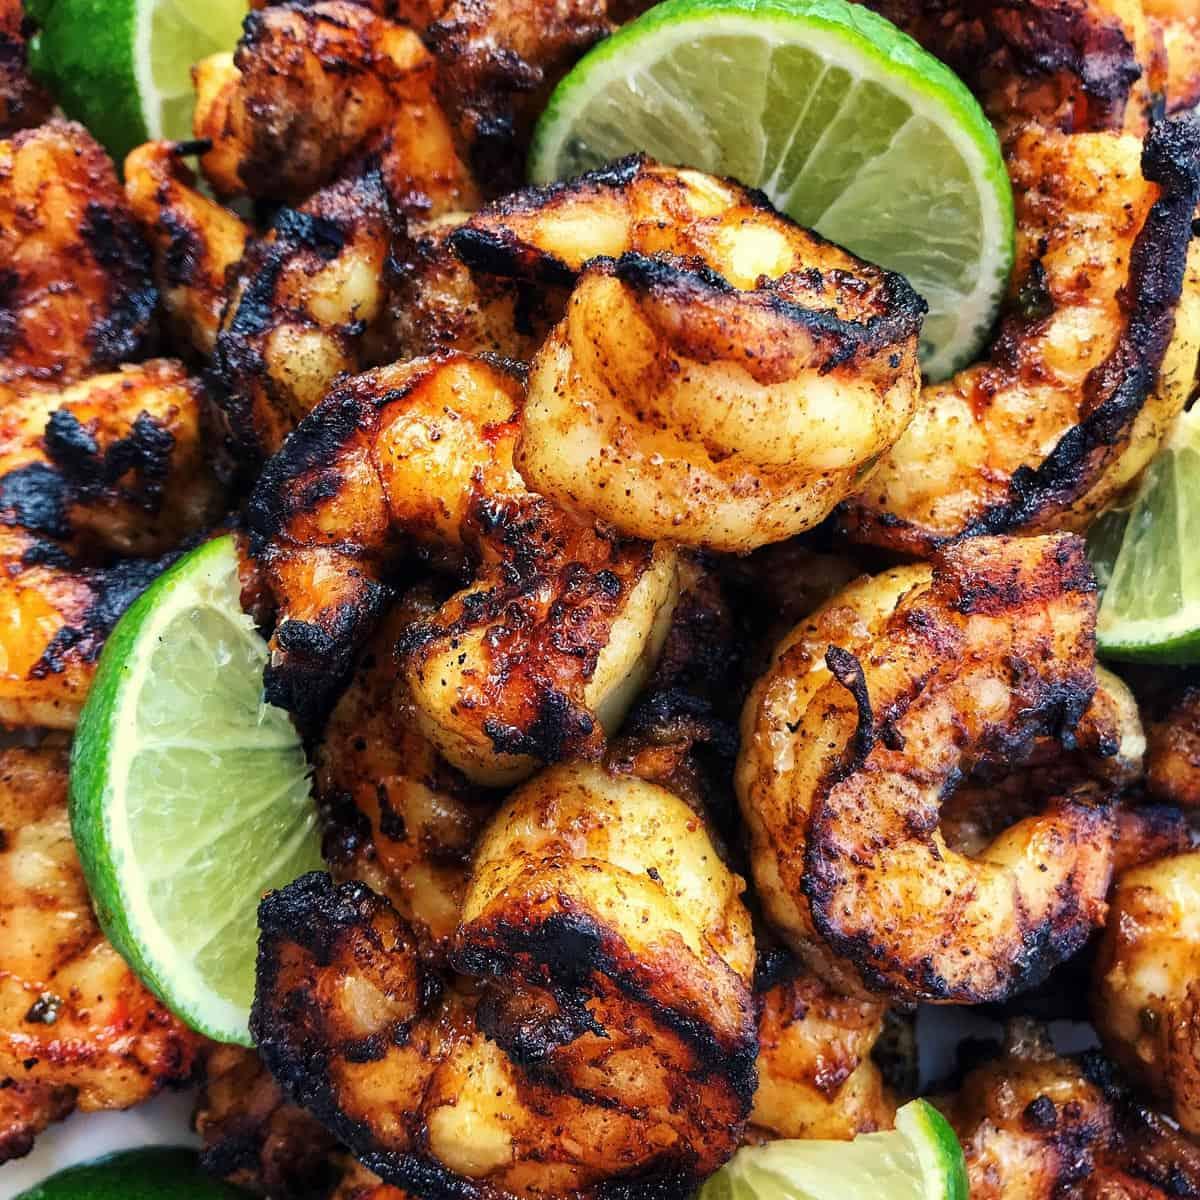 margarita grilled shrimp and fresh limes